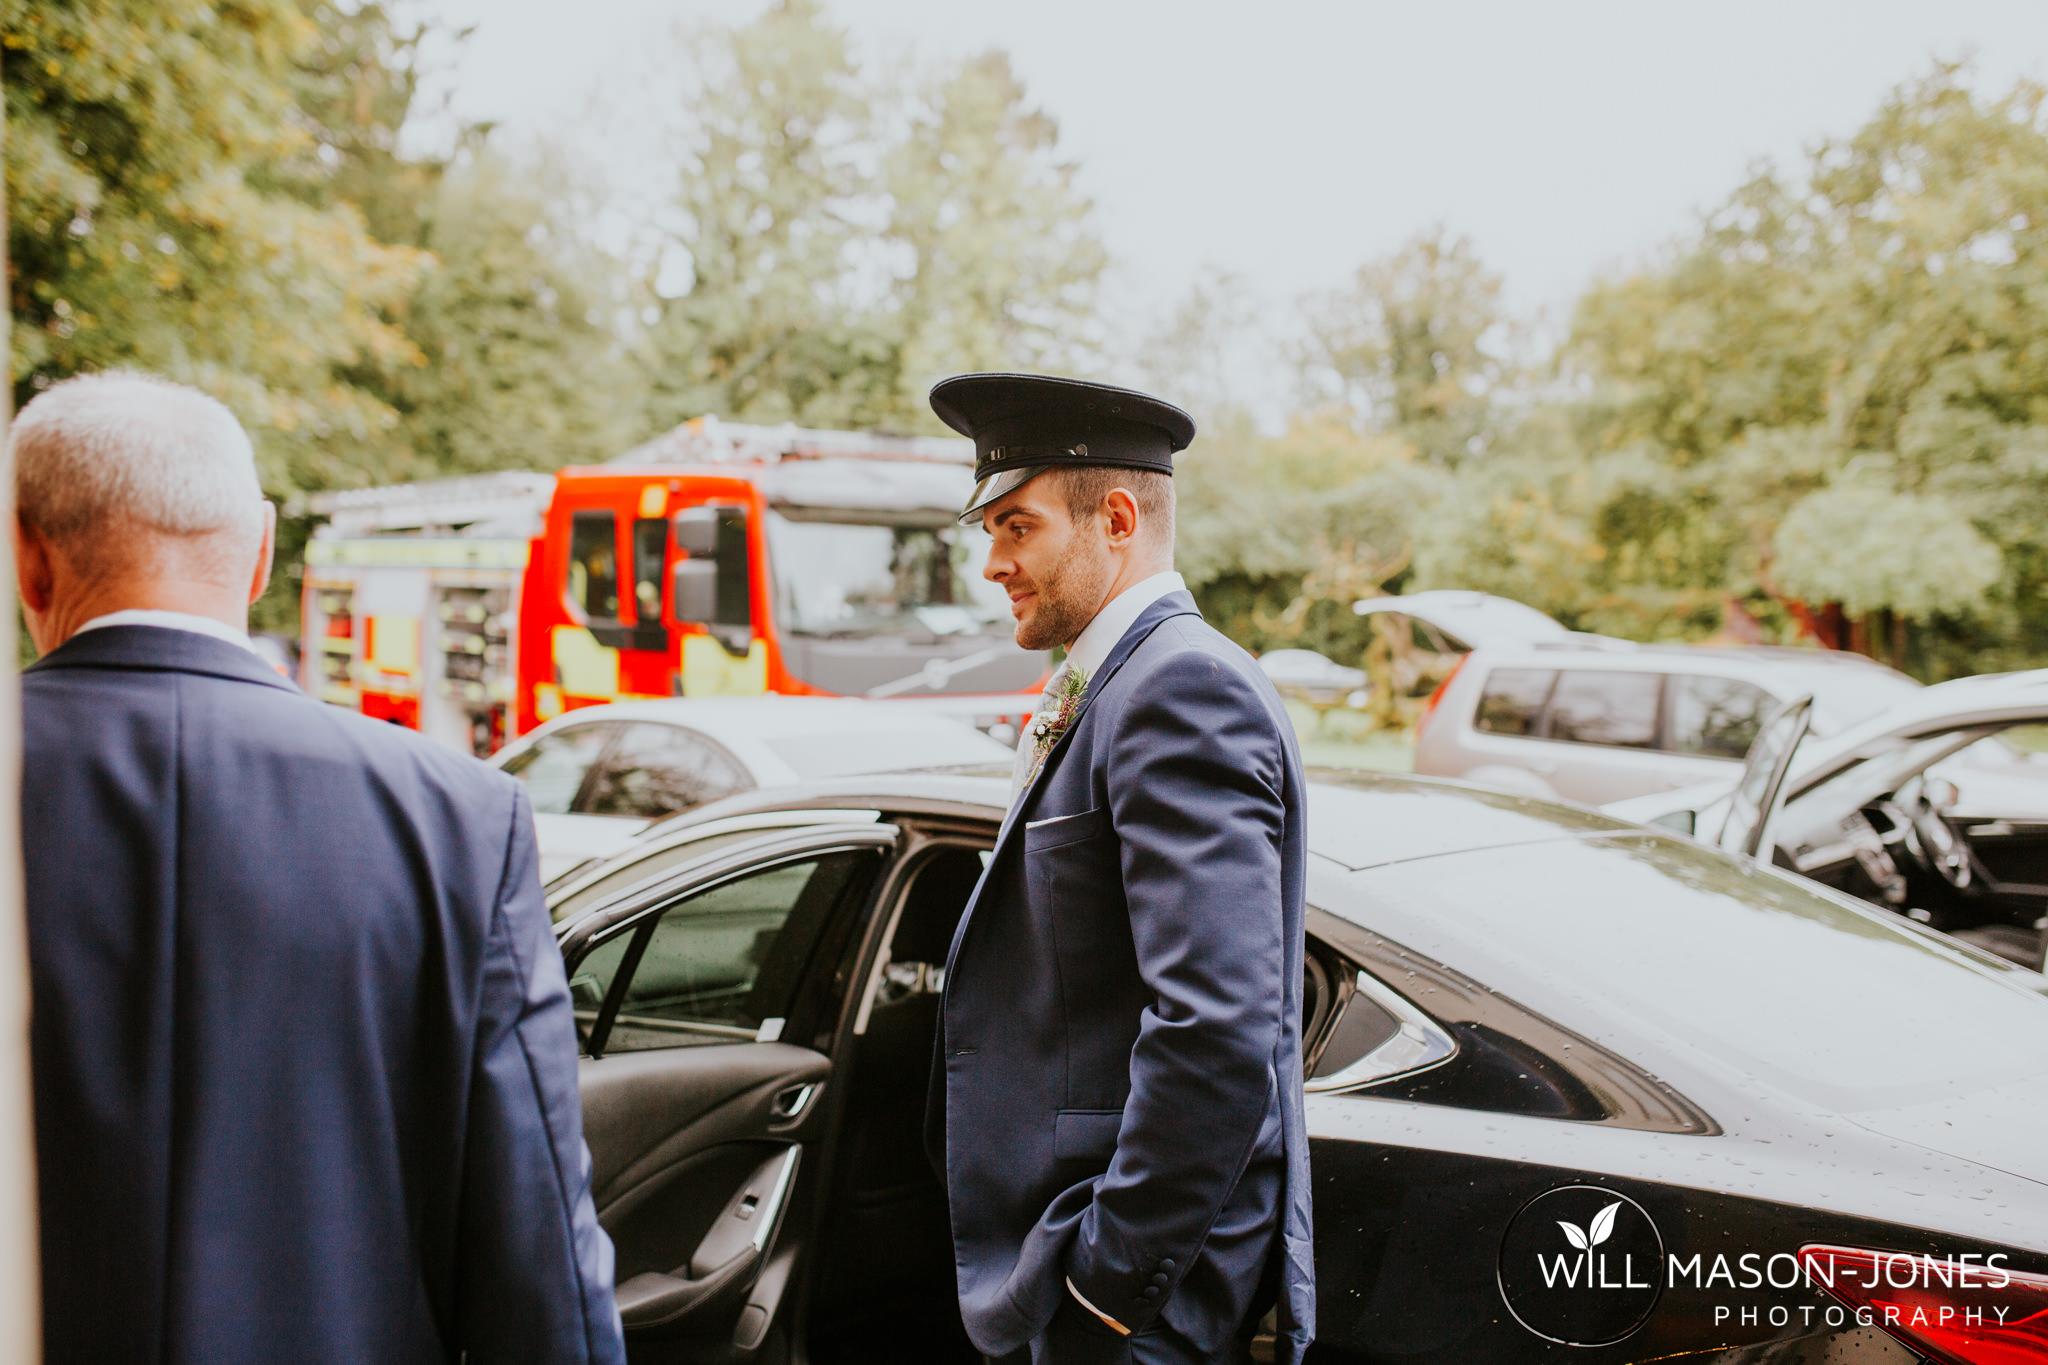 plas-glansevin-wet-rainy-bridal-wedding-preparations-swansea-photographers-16.jpg